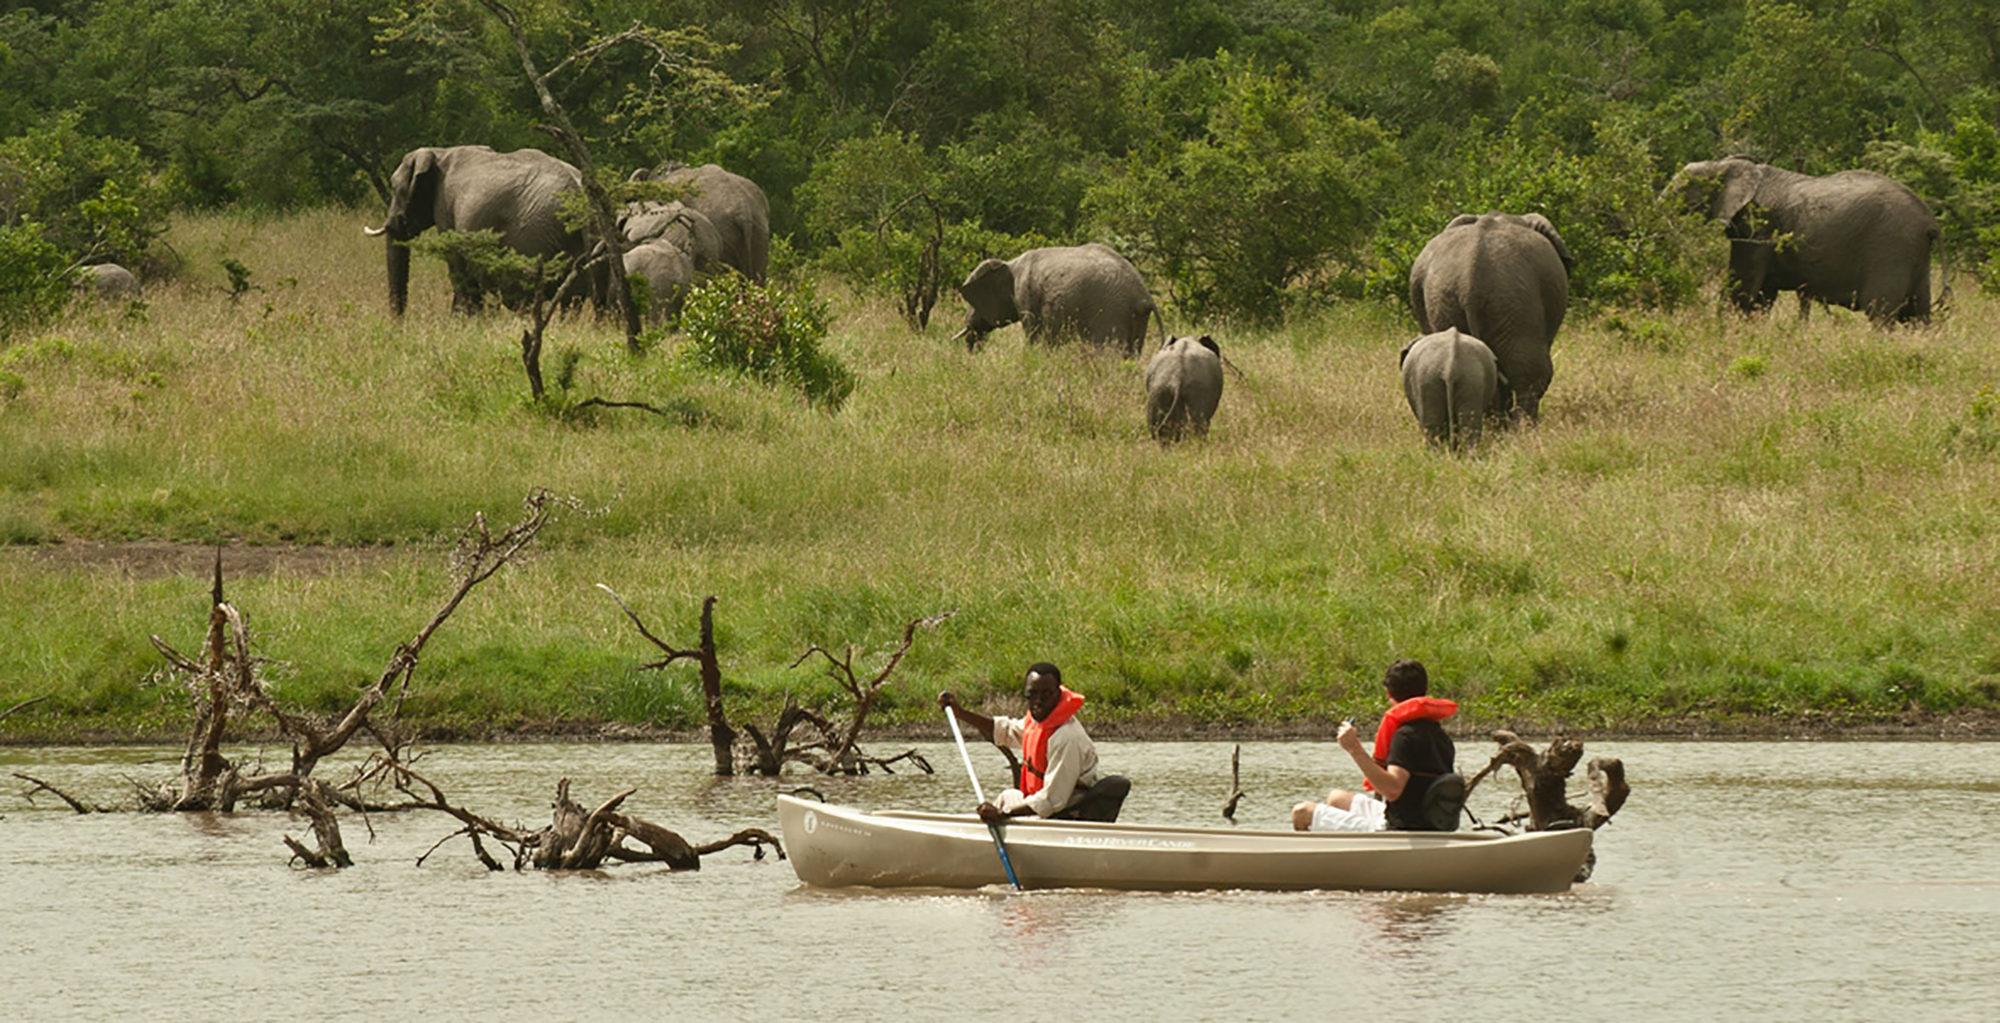 Kenya-Kicheche-Laikipia-Rowing-Elephant